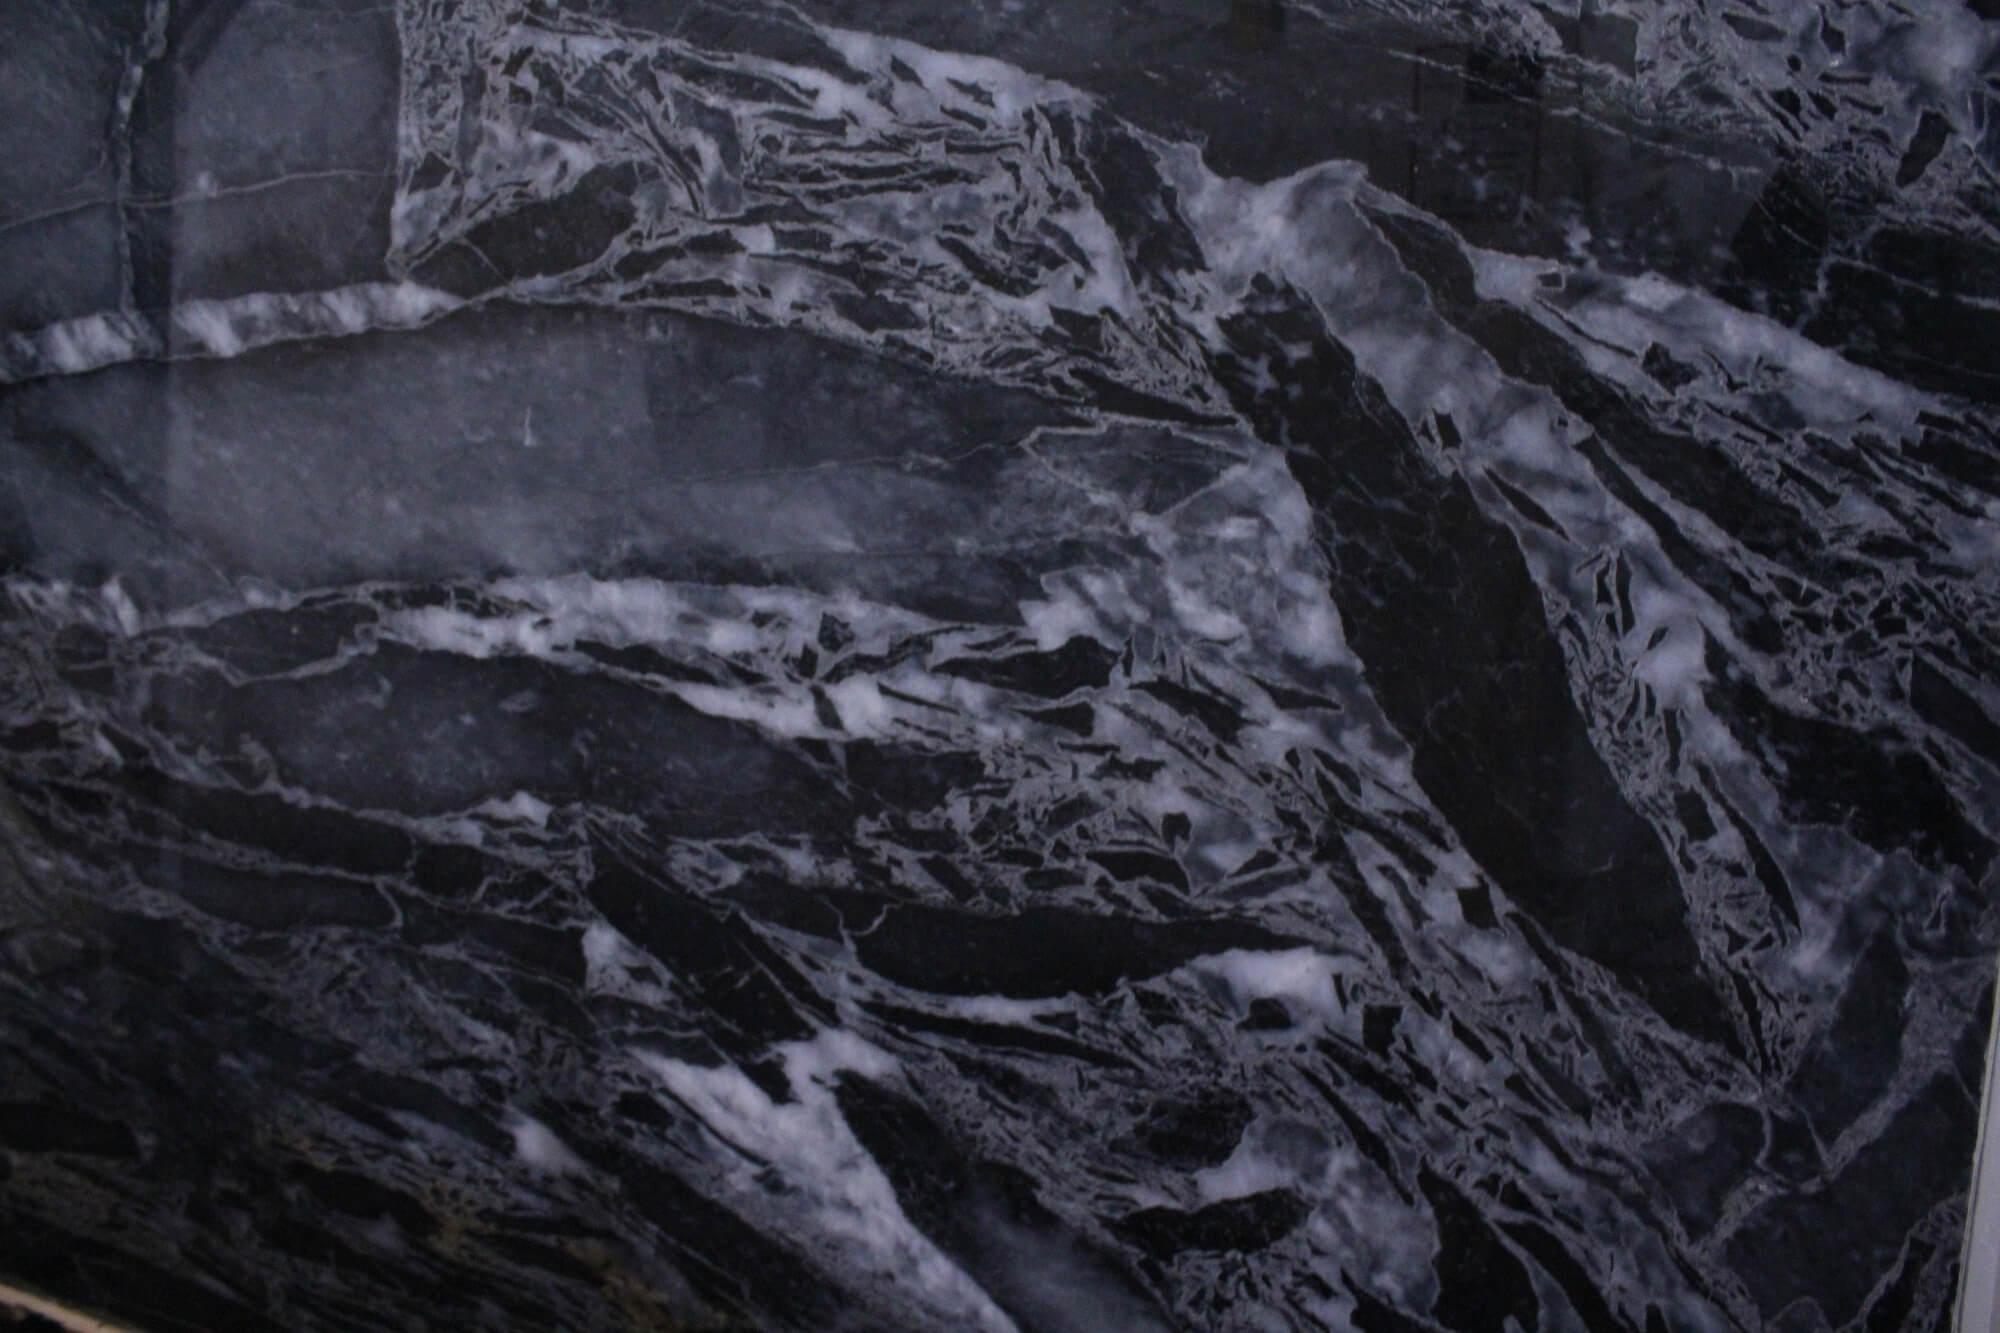 BLACK LEOPARD фото 1 — камень от Bevers Marmyr